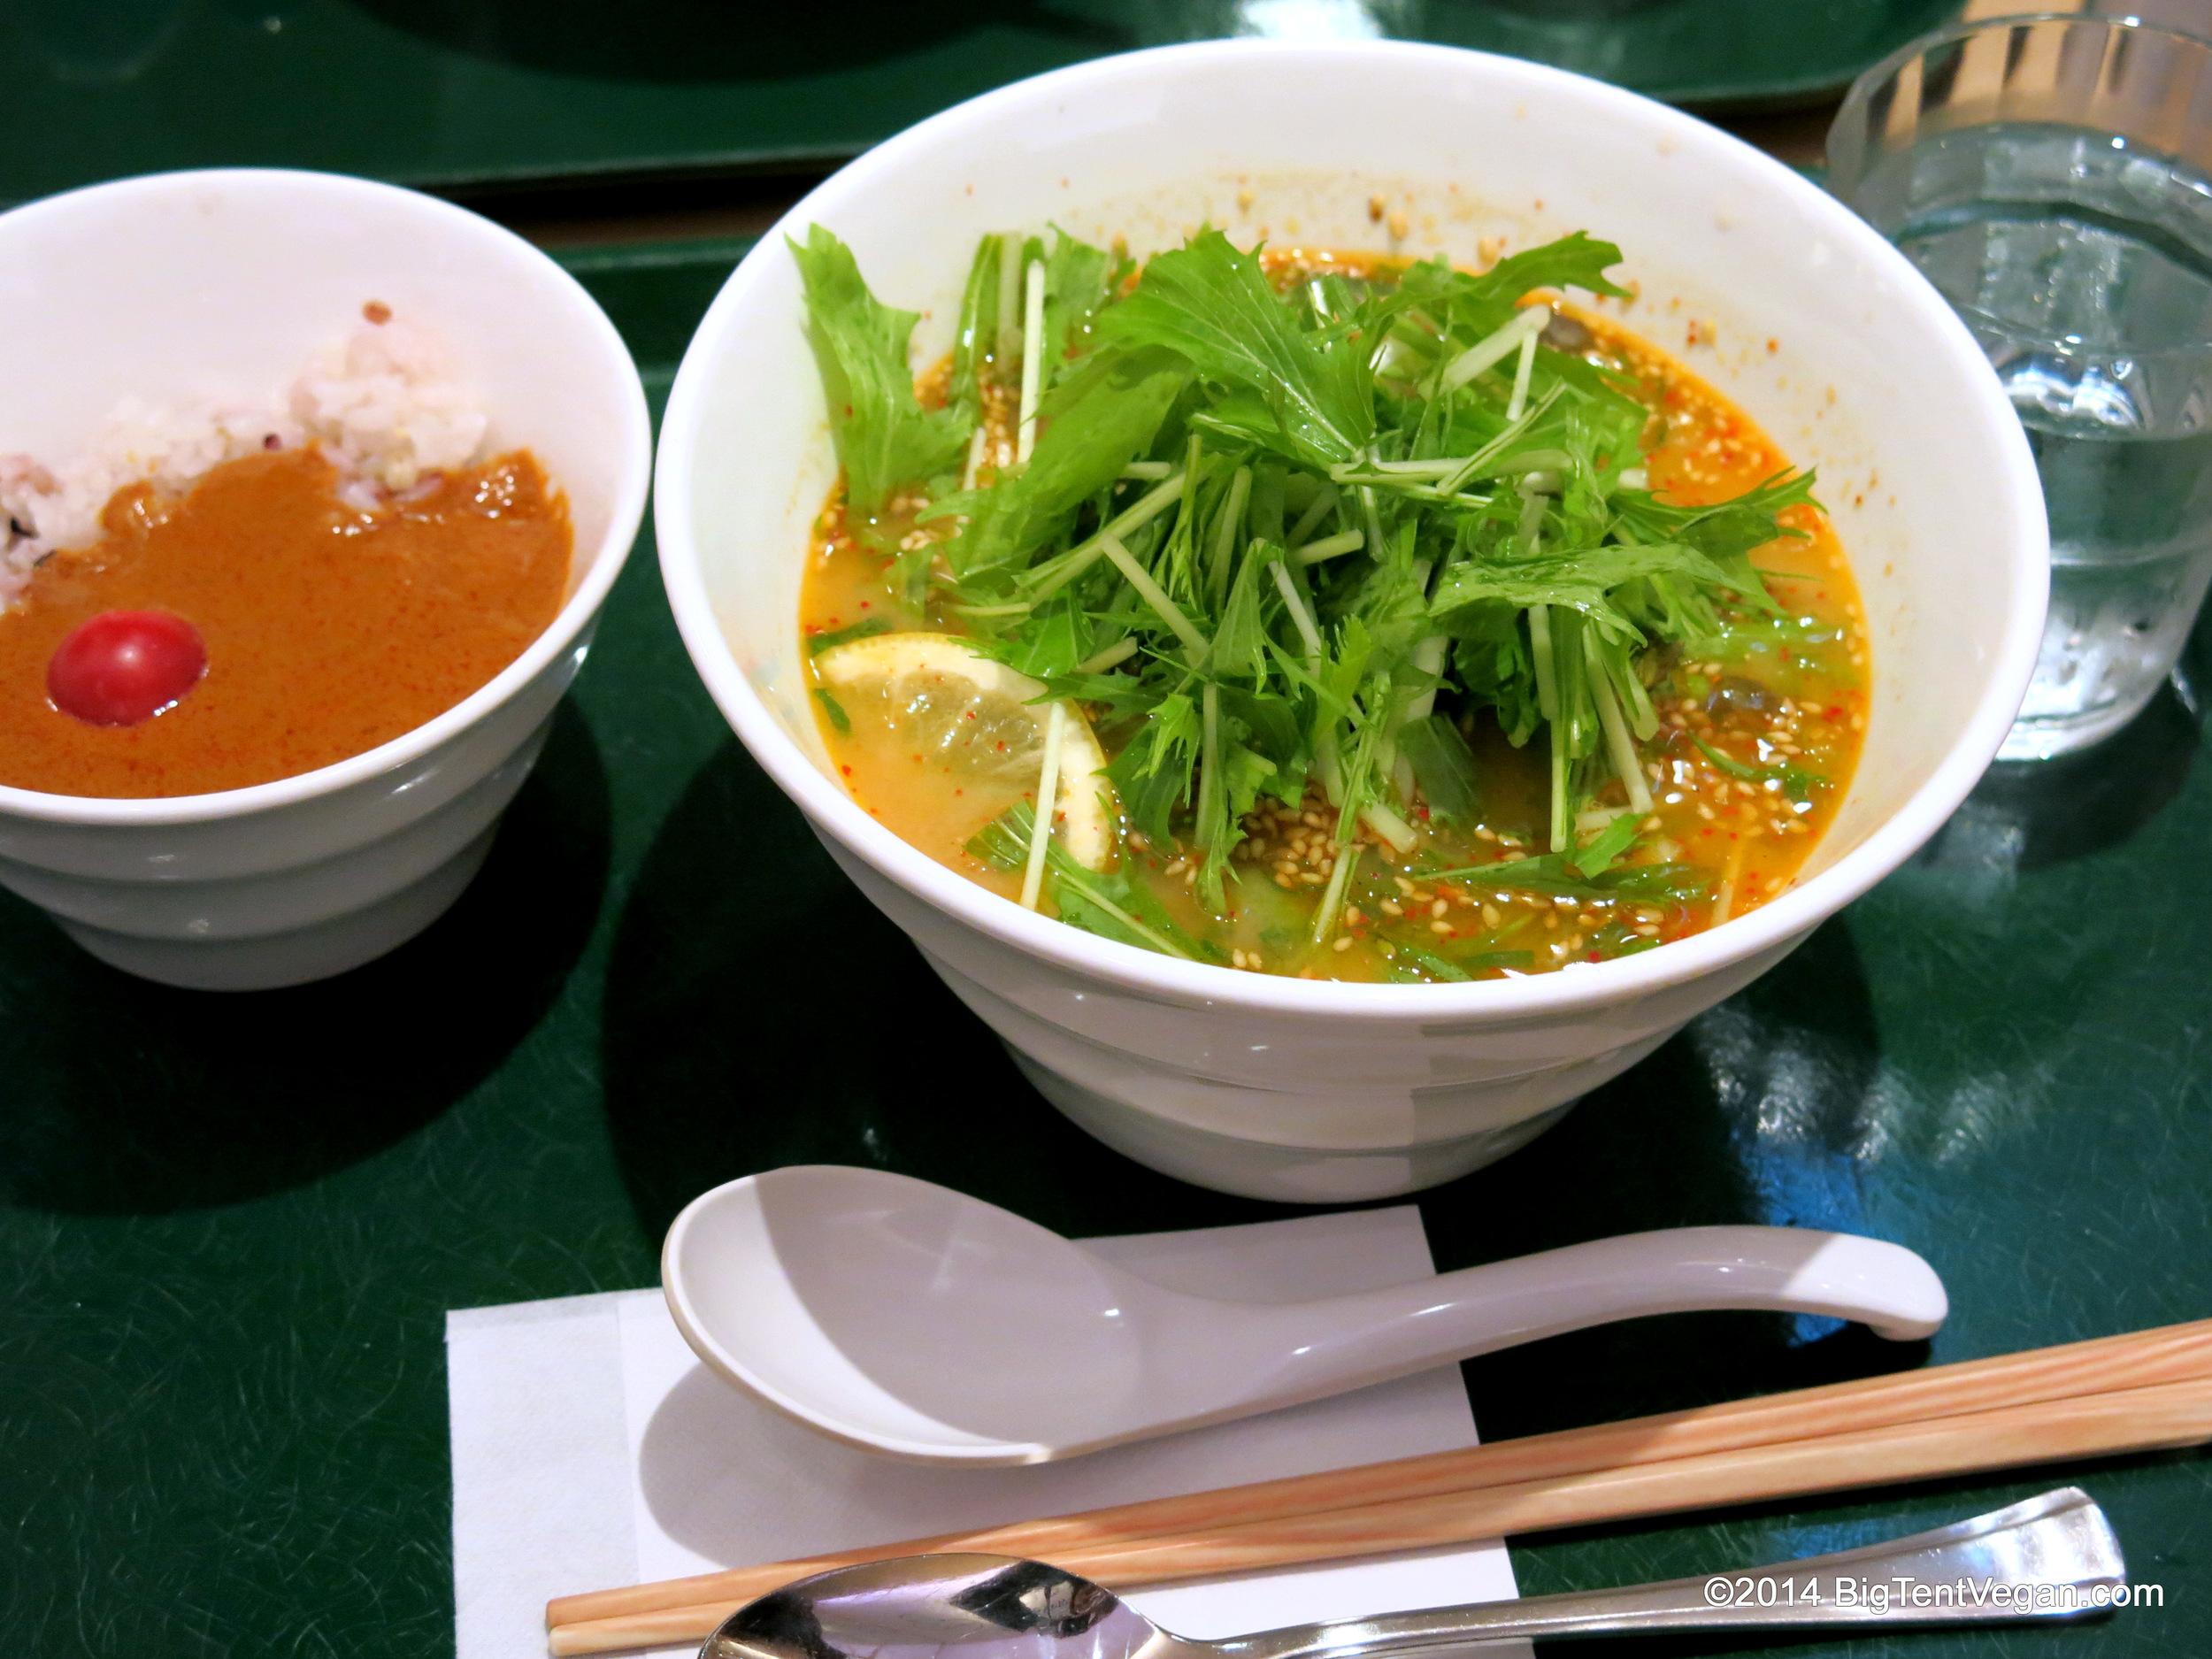 Shirunashi Tantan Noodle Bowl with a side of Smile Curry at 100% vegan T's Tantan inside Tokyo Station (Tokyo, Japan)